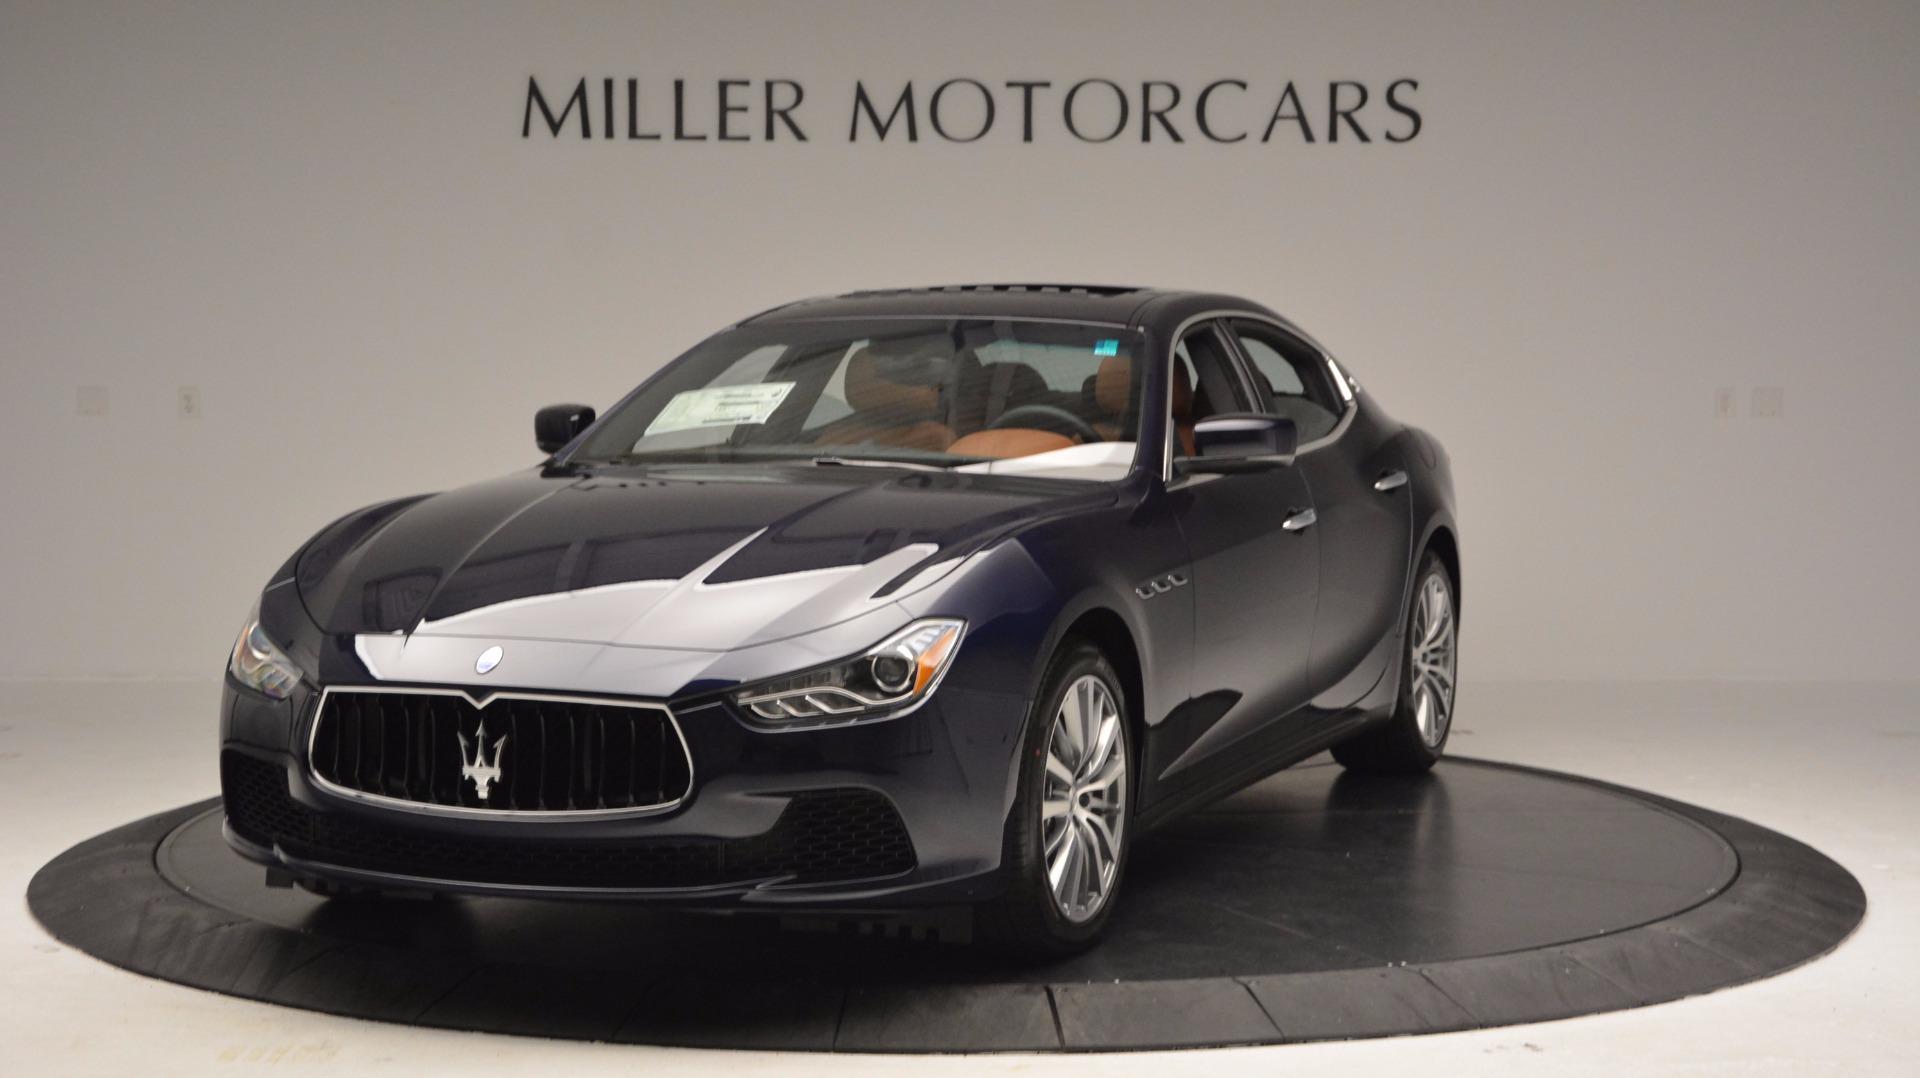 New 2017 Maserati Ghibli S Q4 For Sale In Greenwich, CT 1119_main